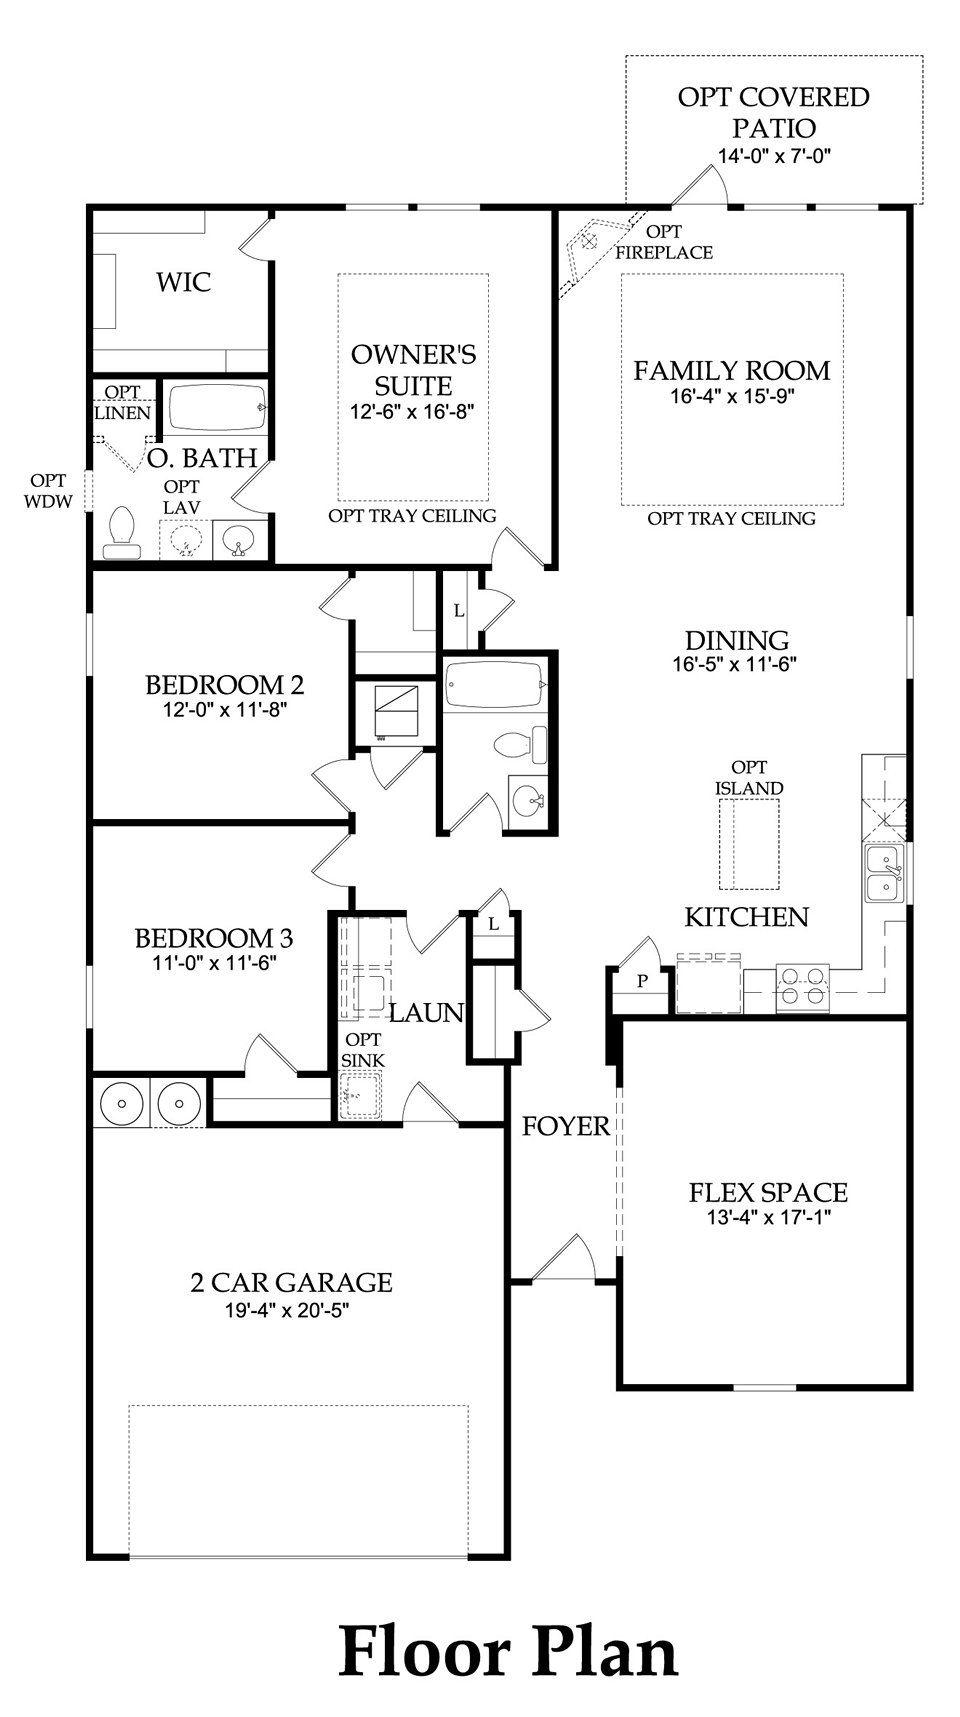 44f6b6d1e4f0805adc60a673e0babce9 stirling bridge austin tx new homes centex homes compton,Centex Home Plans